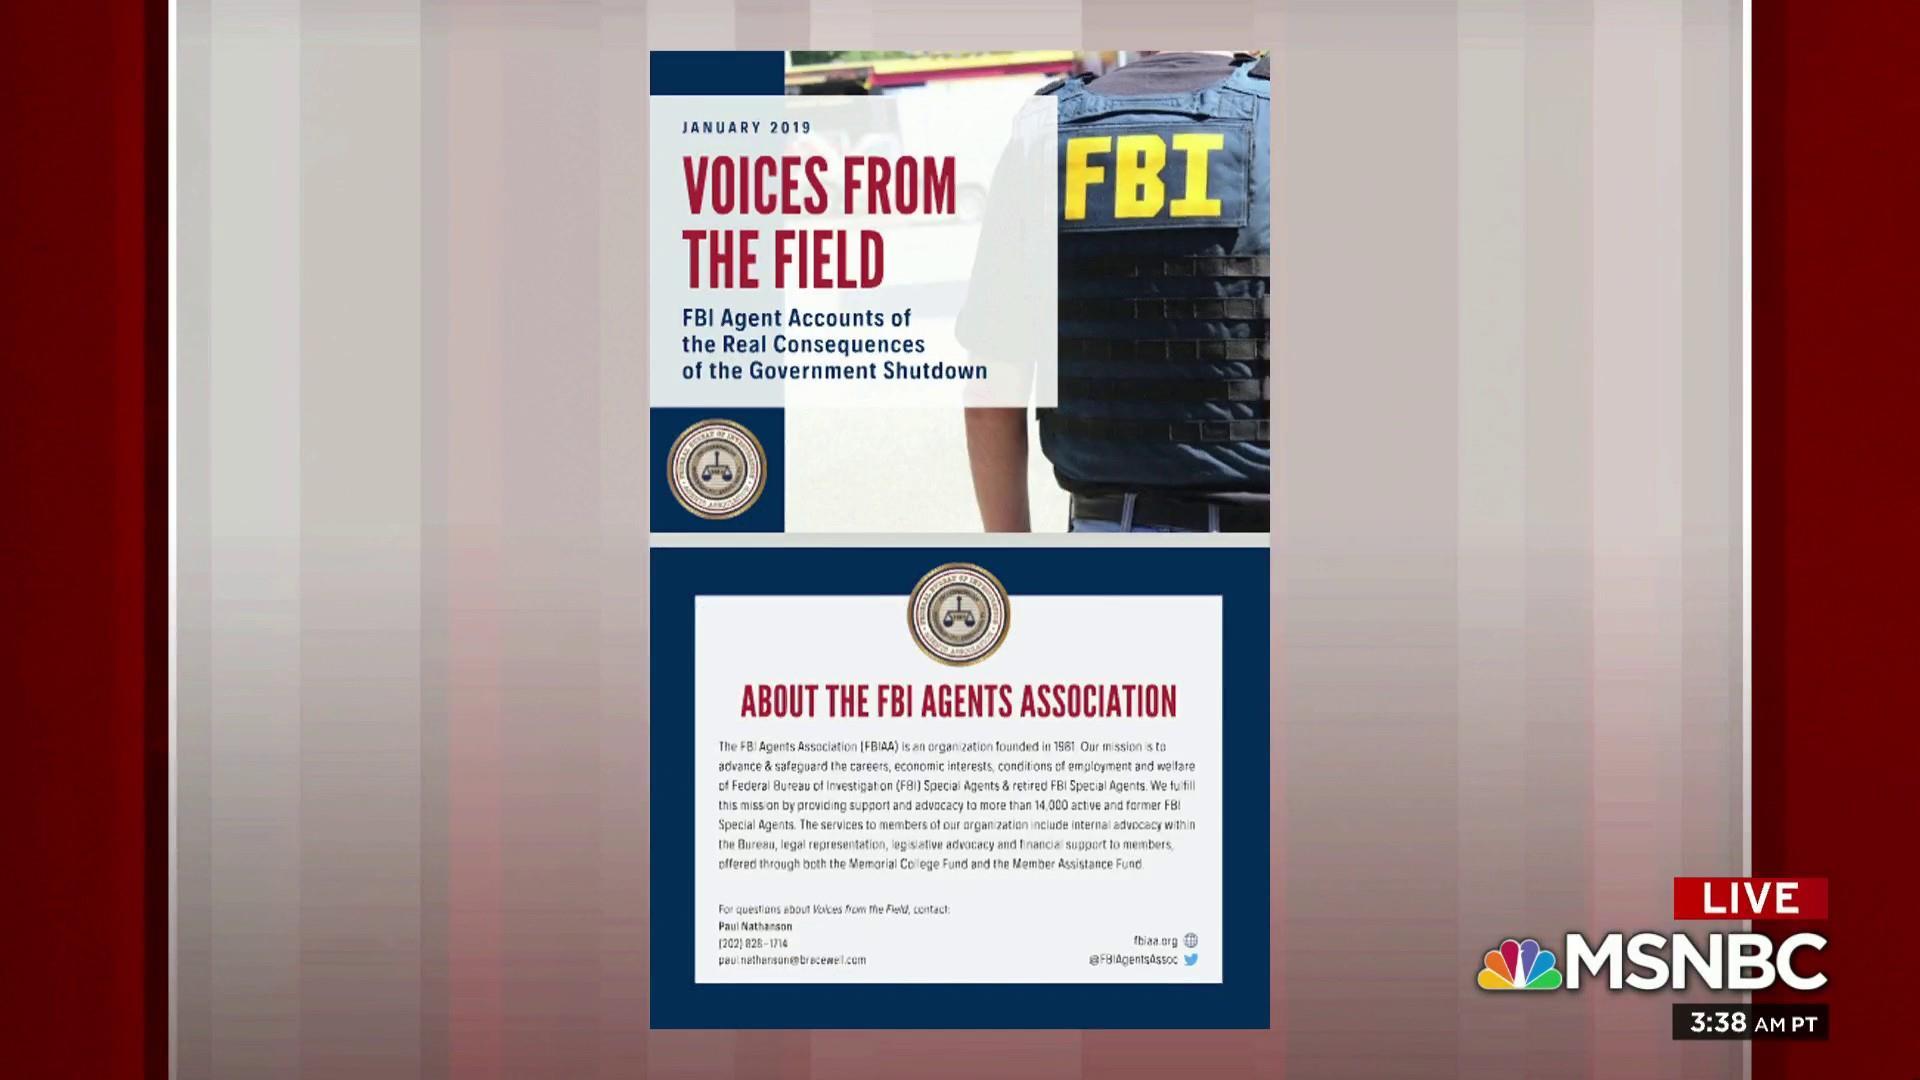 Shutdown slows FBI investigations, says agents union